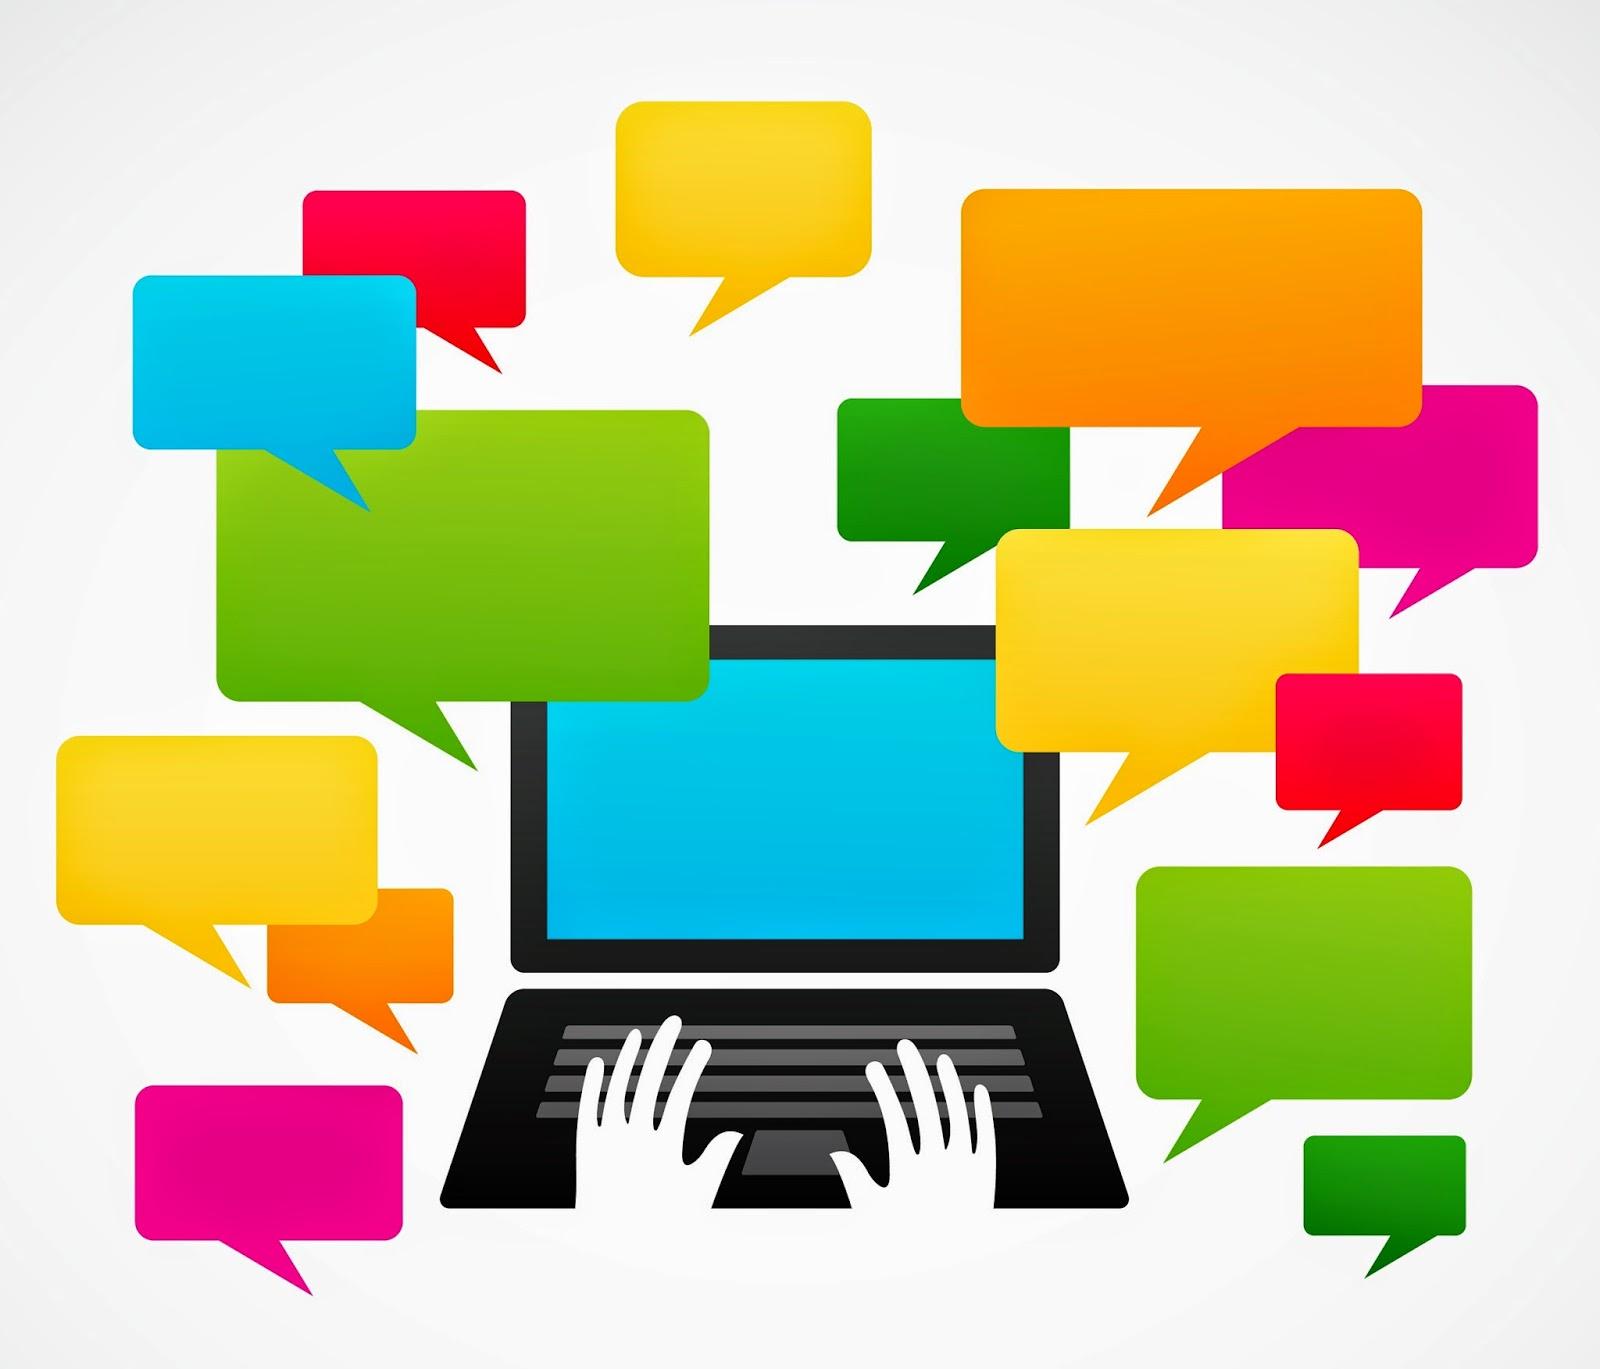 https://www.blogger.com/blogger.g?blogID=629717503532797730#editor/target=post;postID=6690169066321054189